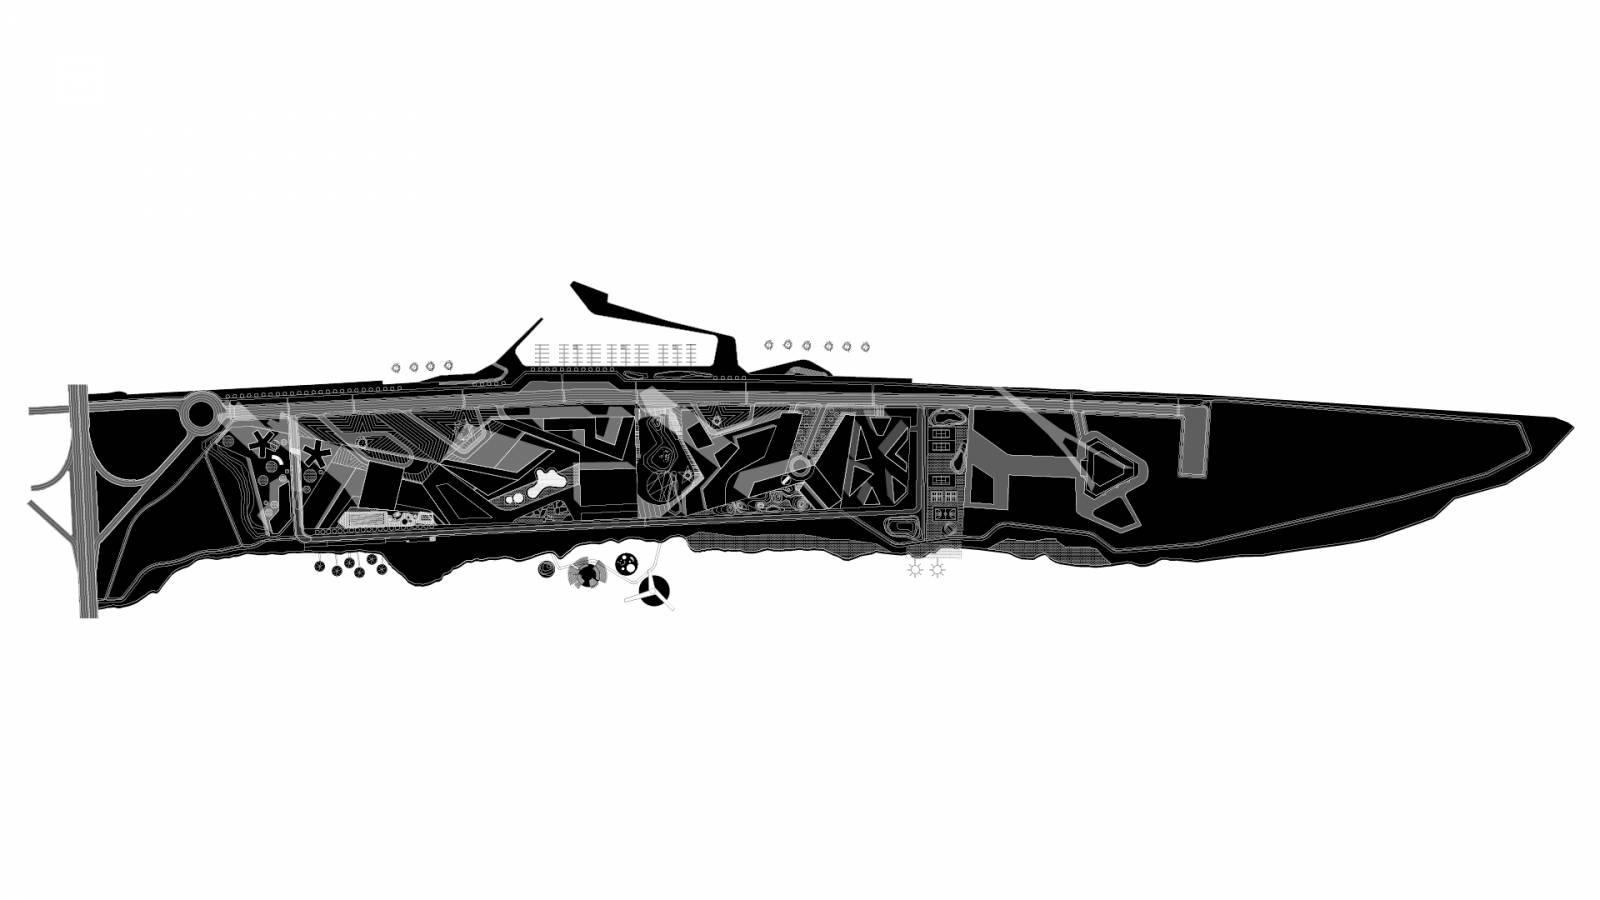 PUBLIC SPACE - Zakusala - SPOL Architects